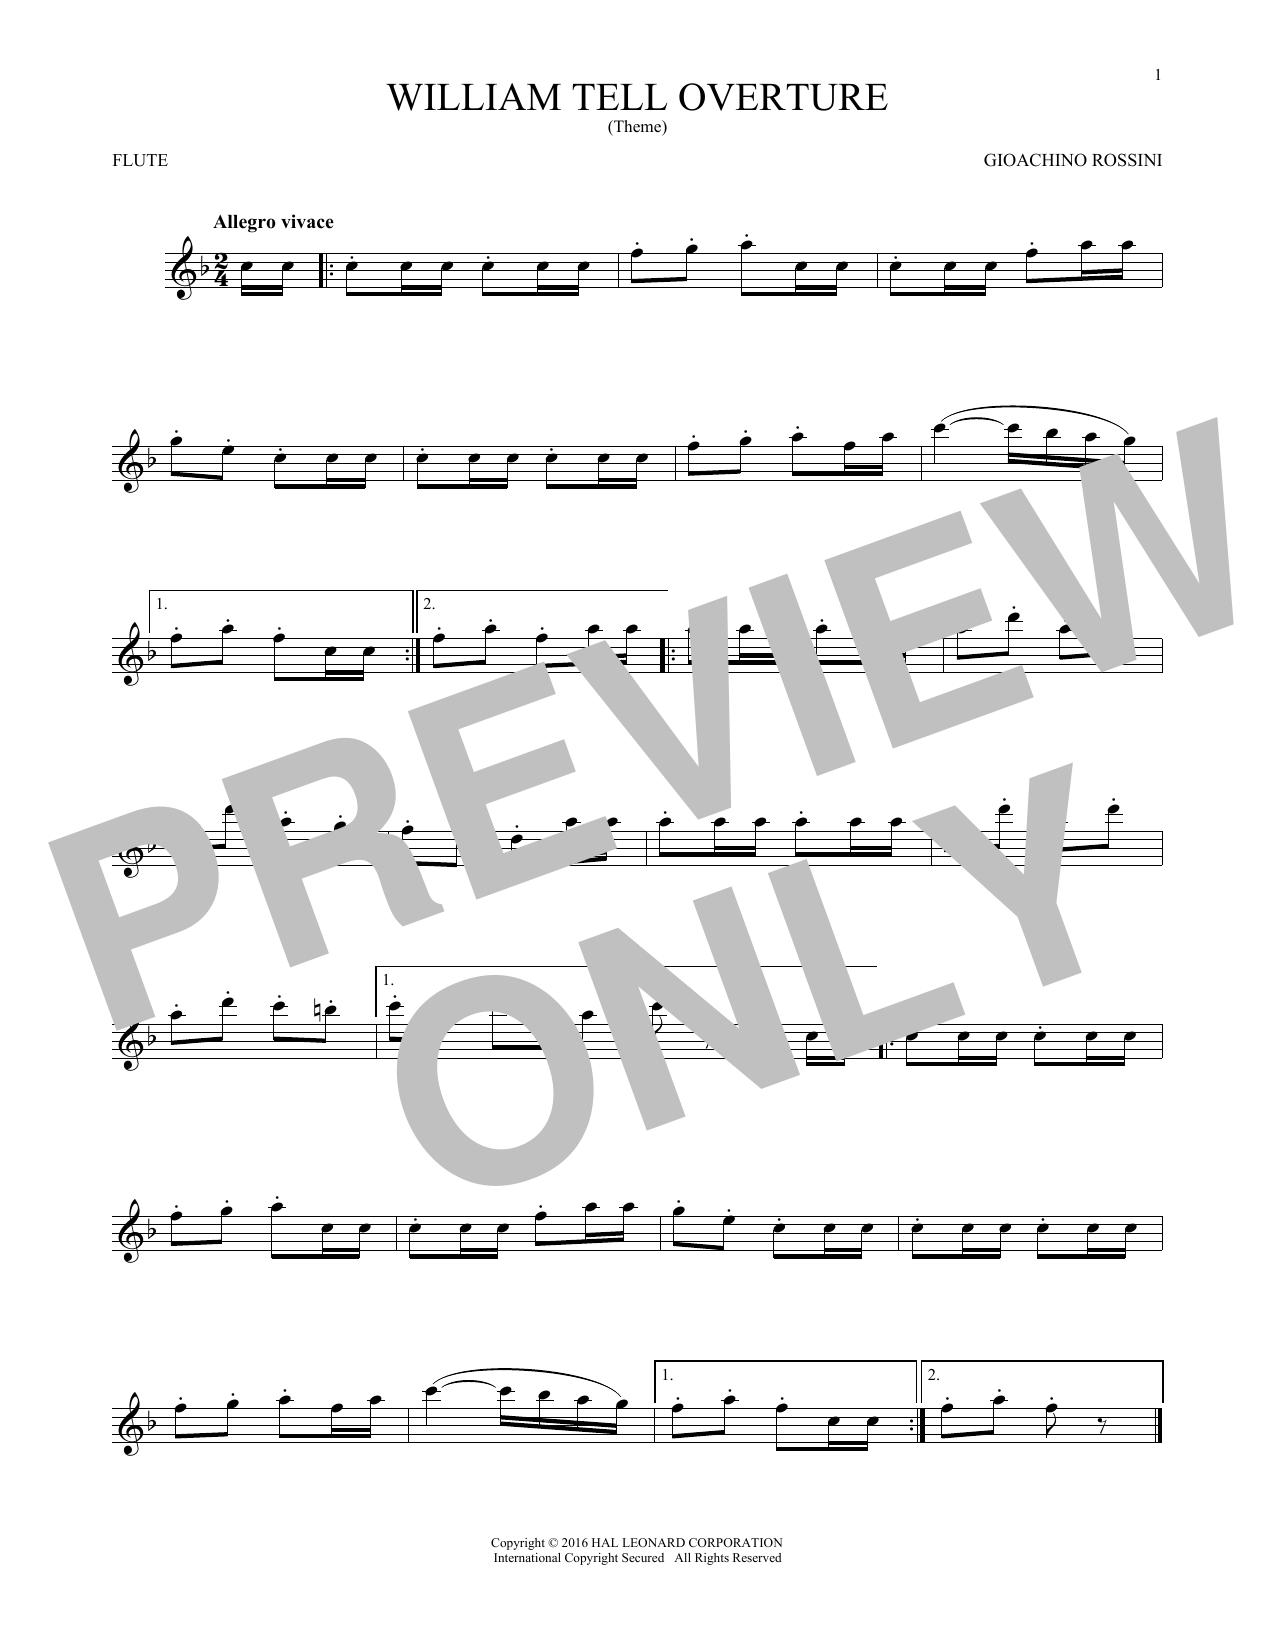 William Tell Overture (Flute Solo)